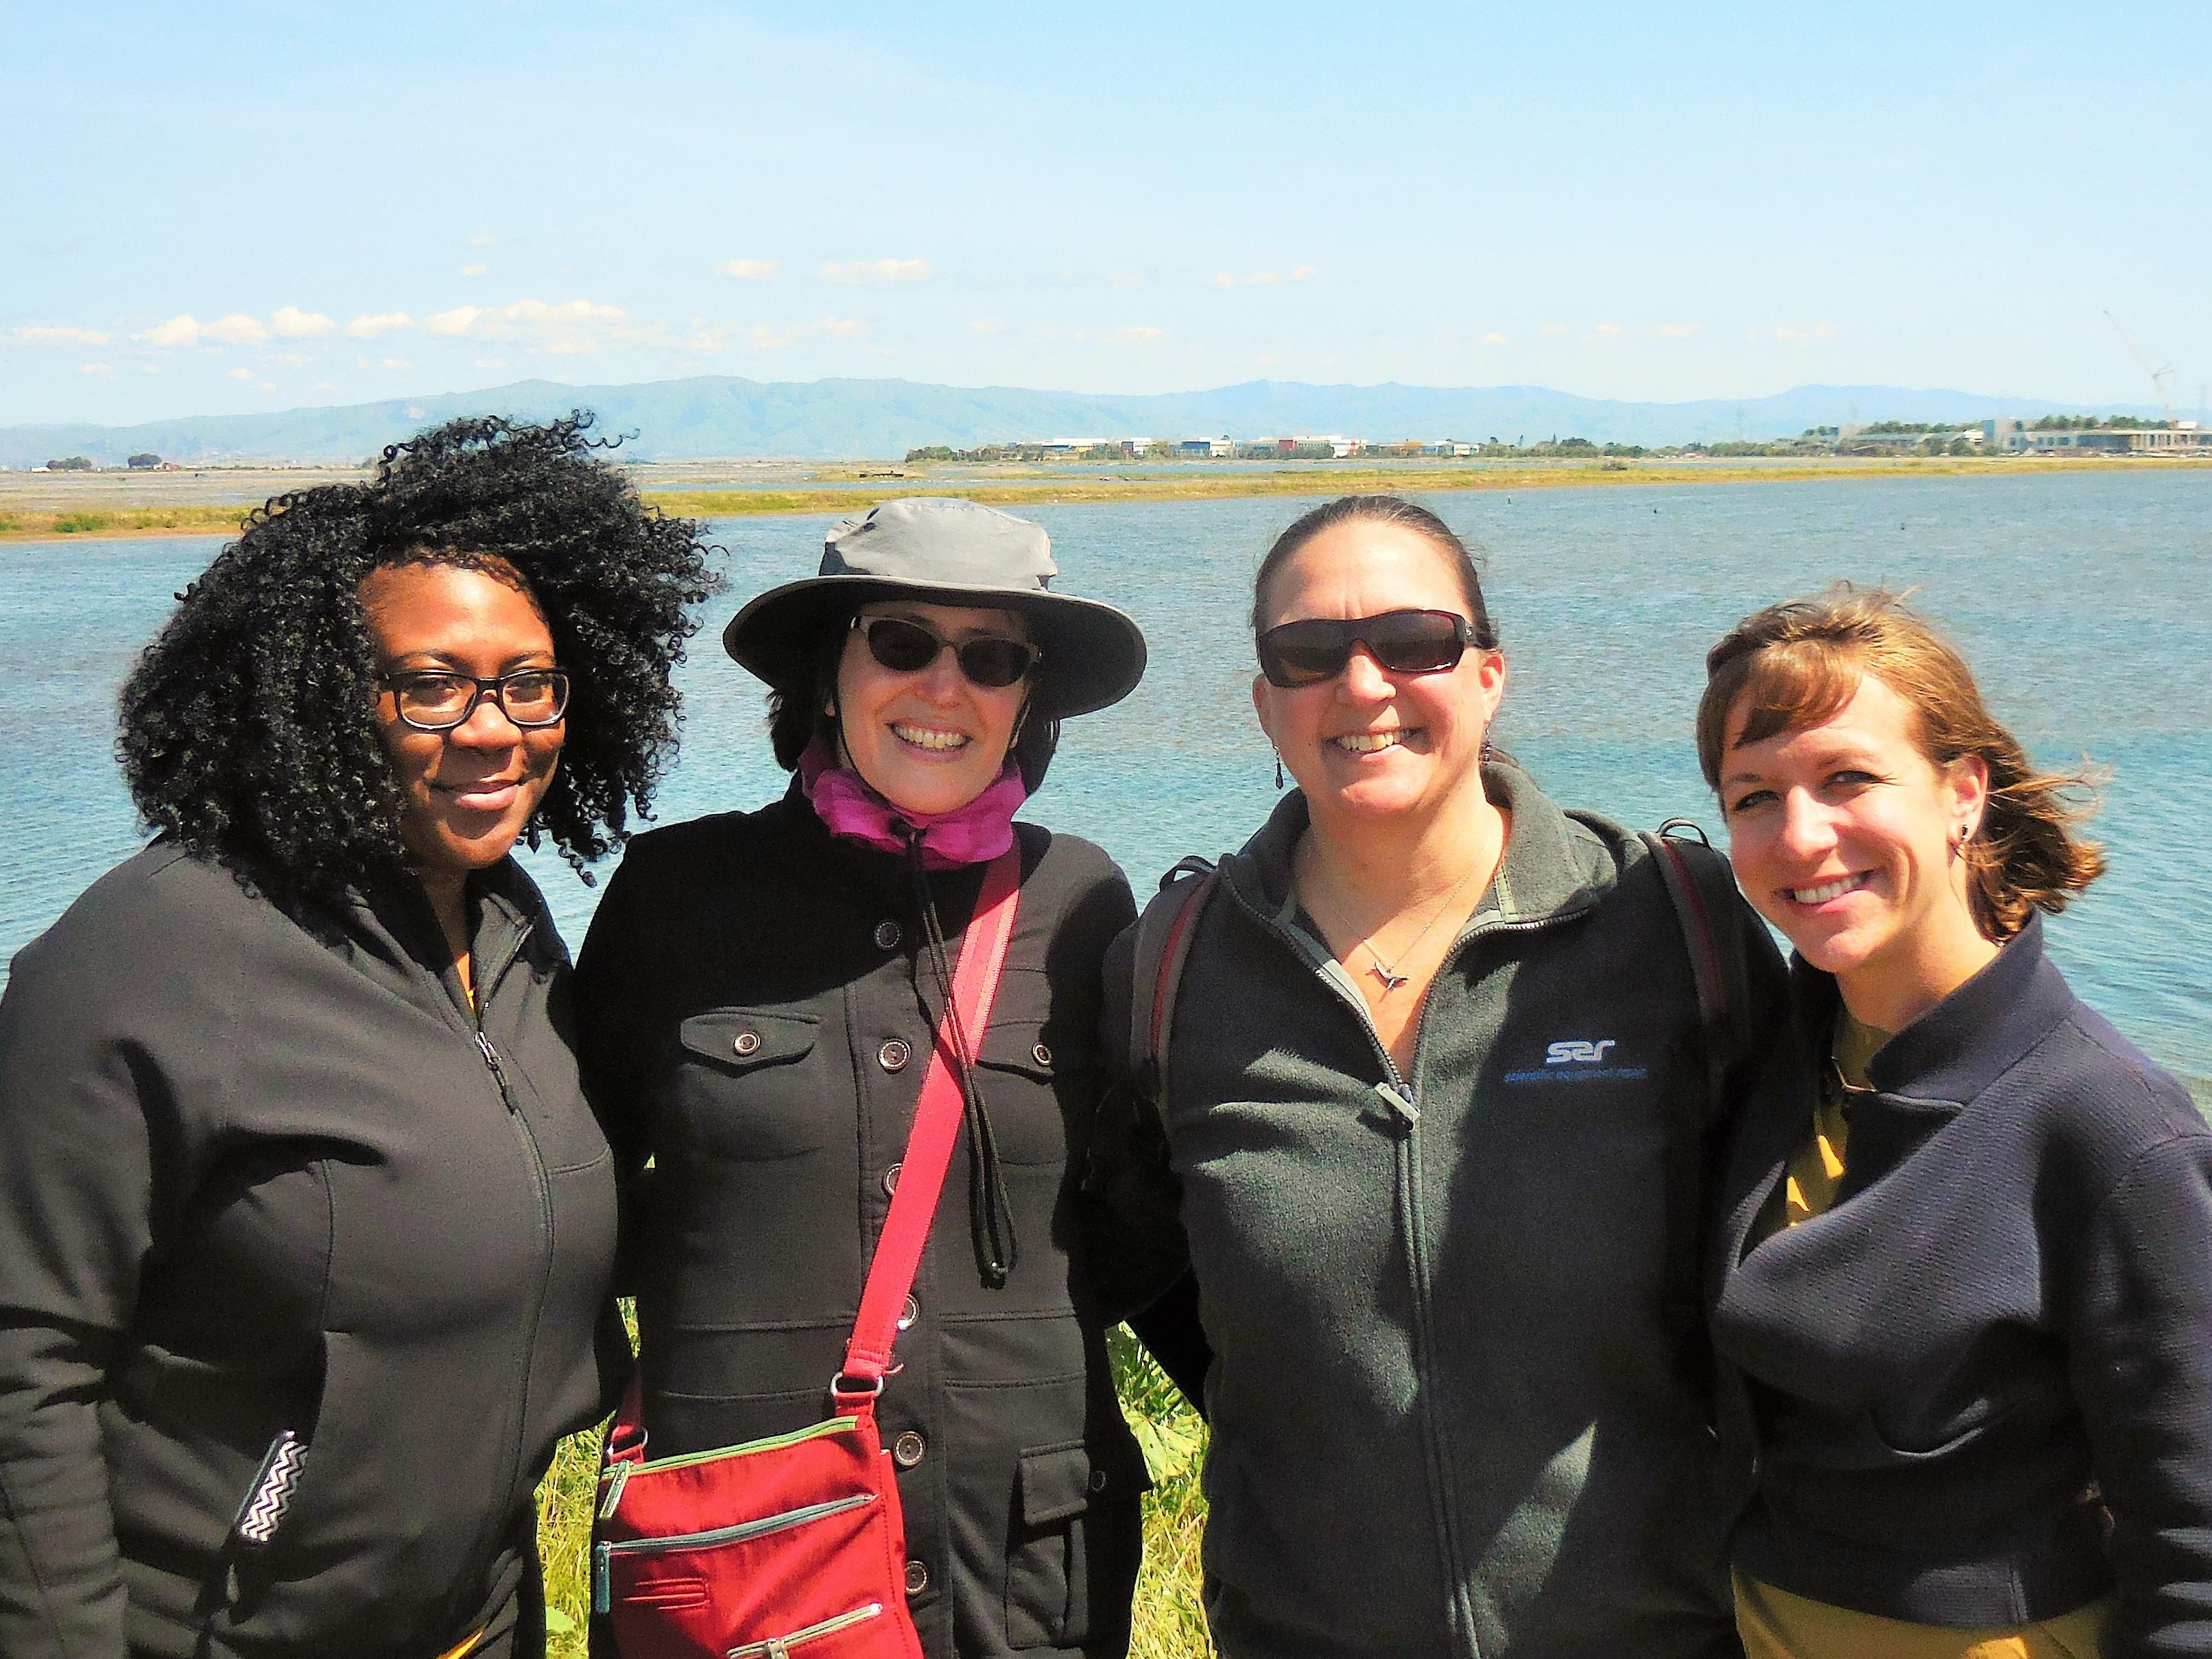 San Francisco Bay Restoration Authority staff